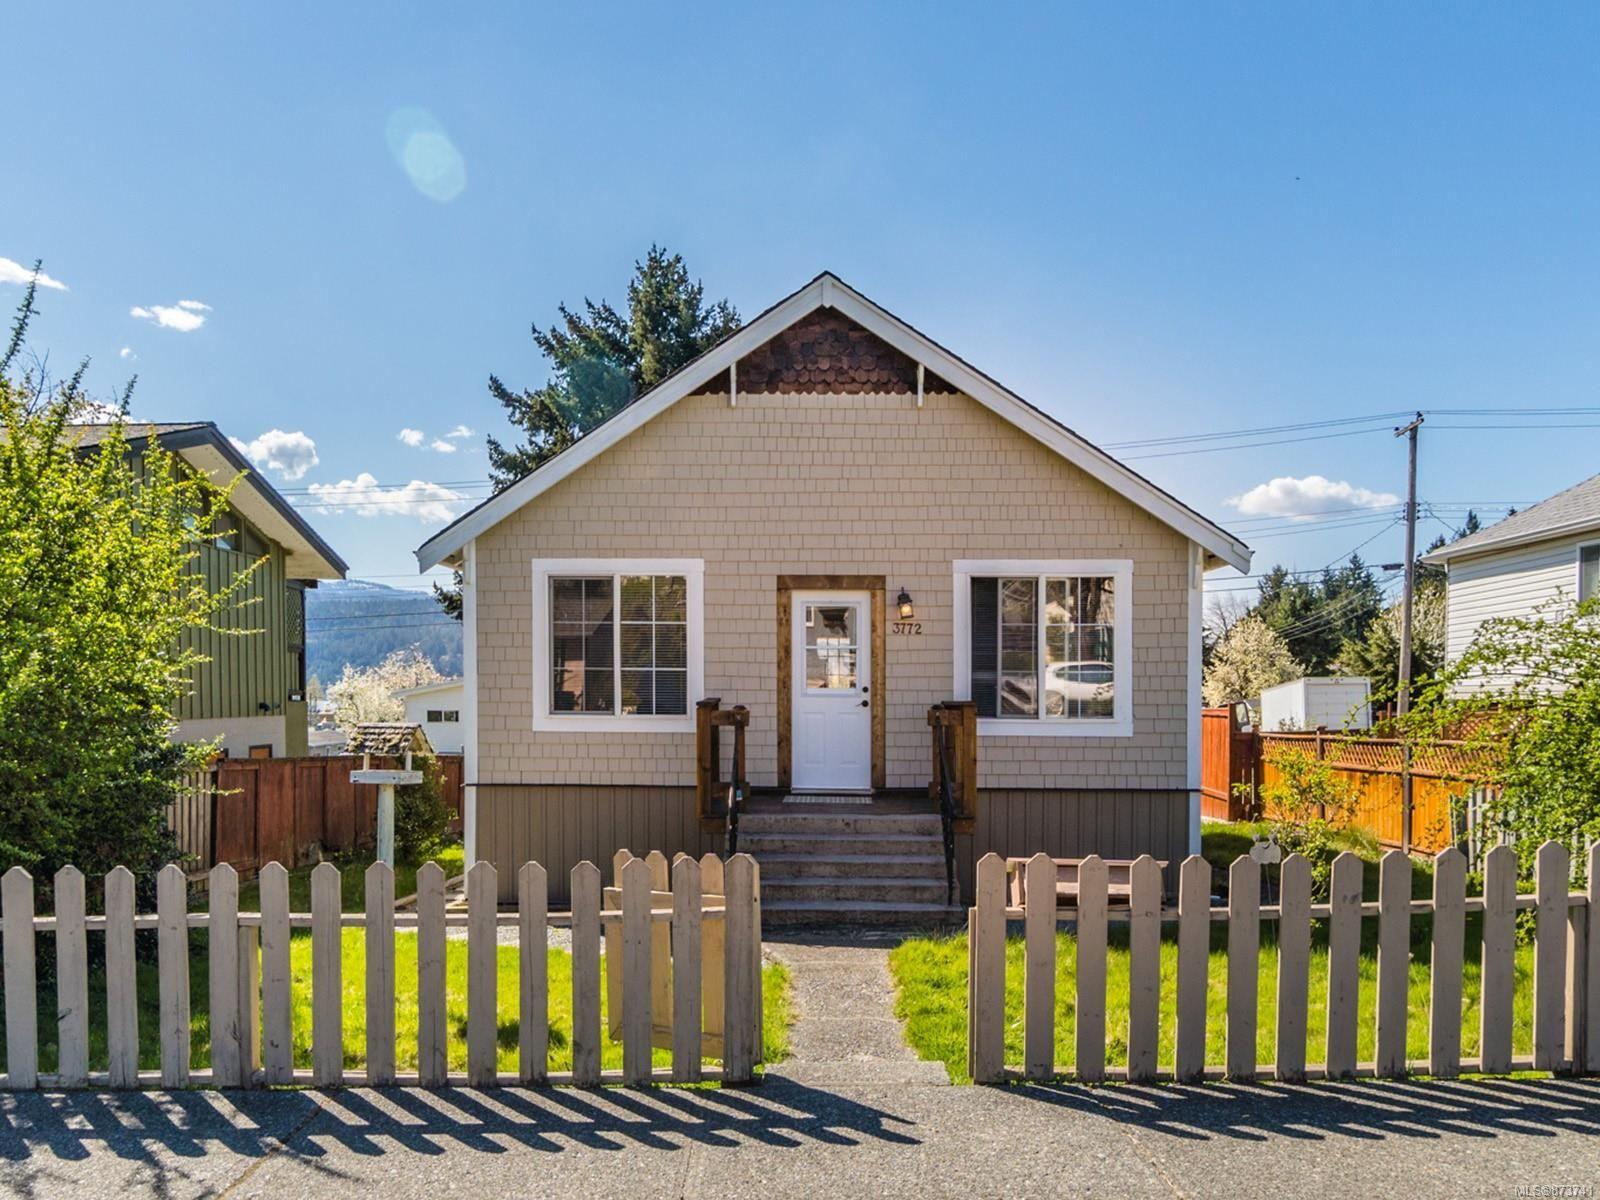 Main Photo: 3772 6th Ave in : PA Port Alberni House for sale (Port Alberni)  : MLS®# 873741